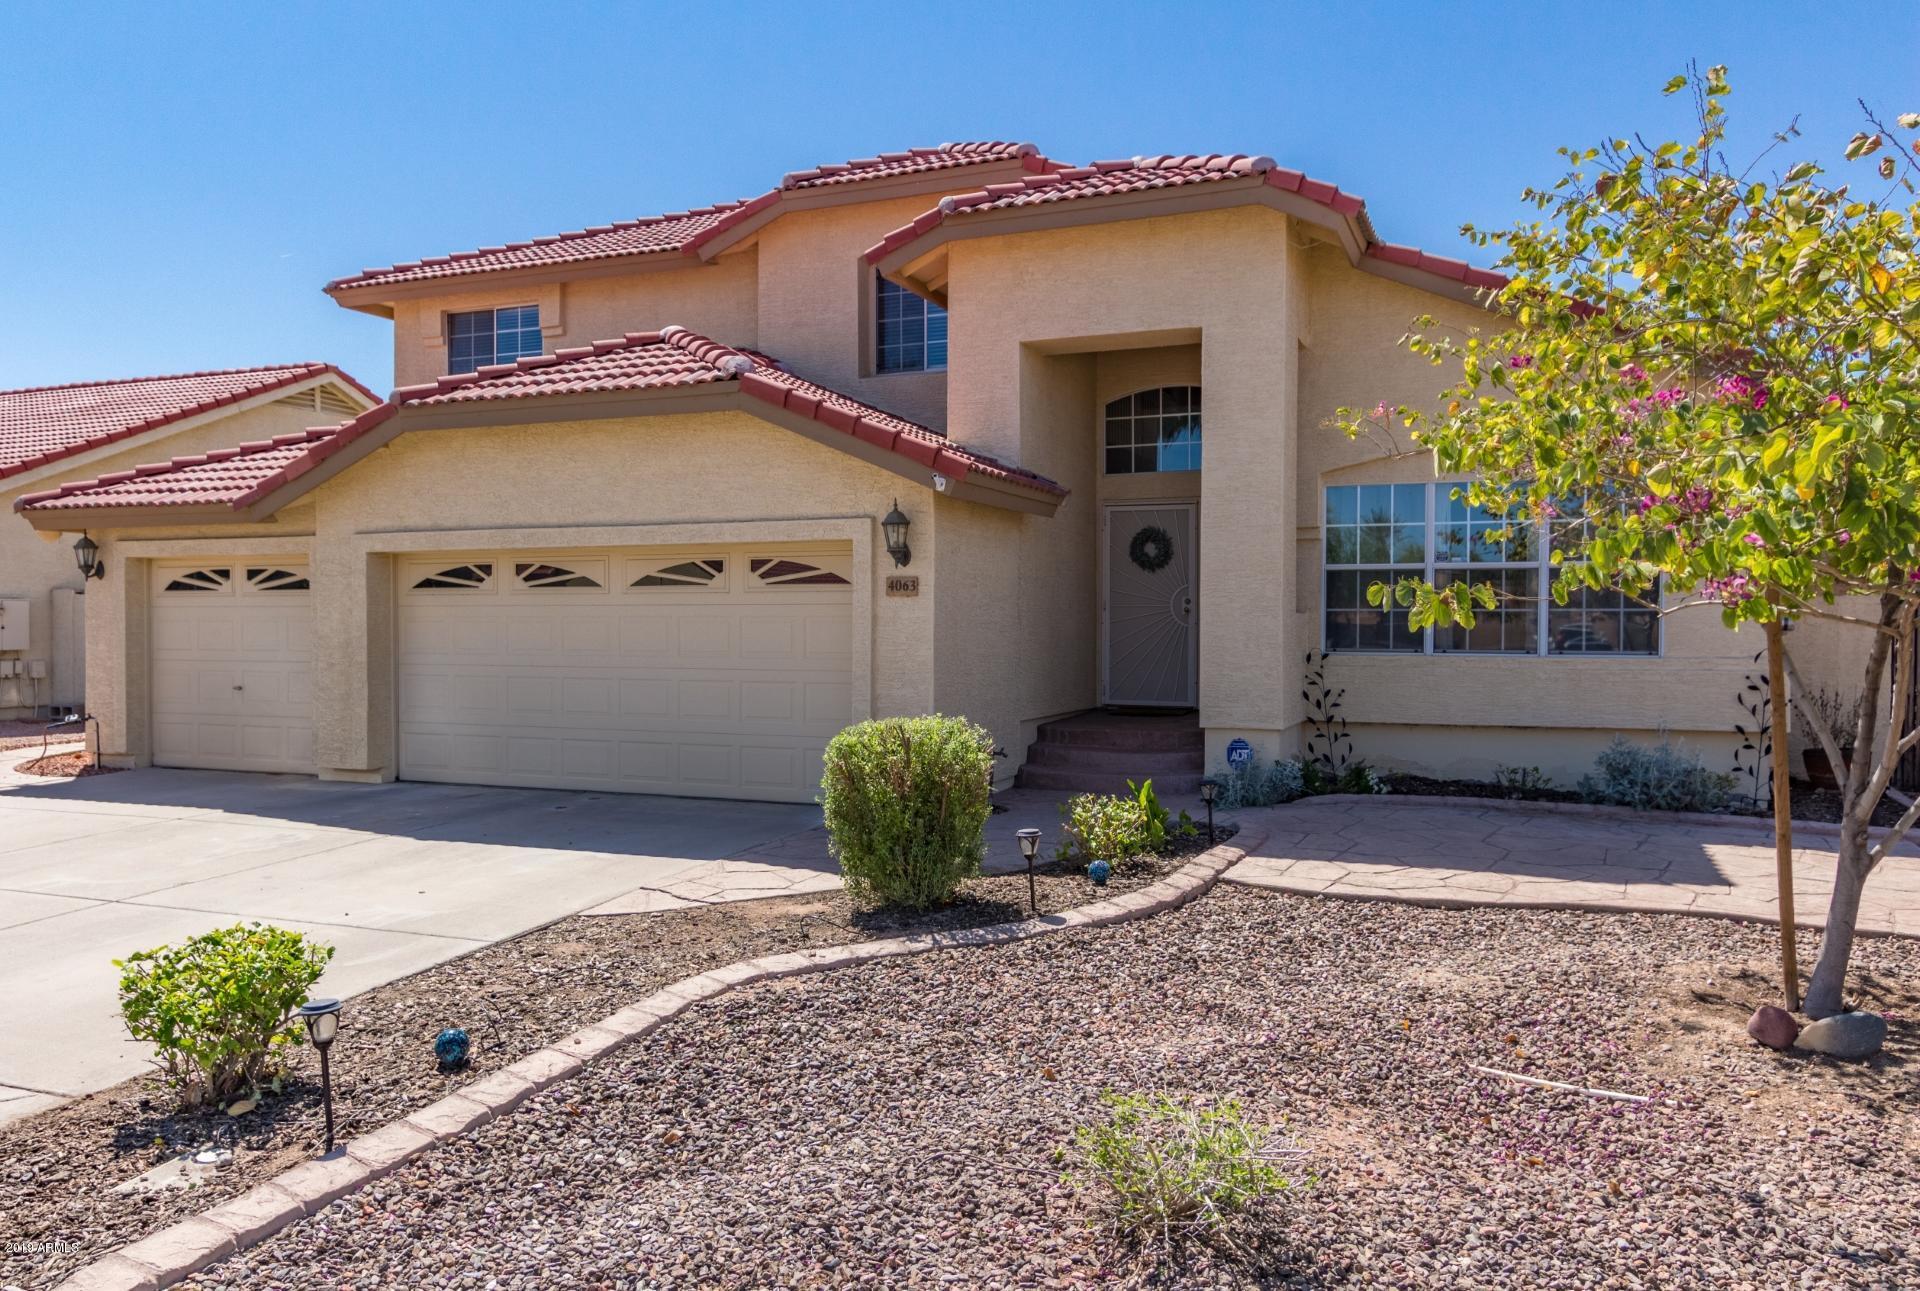 Photo of 4063 W ORCHID Lane, Chandler, AZ 85226